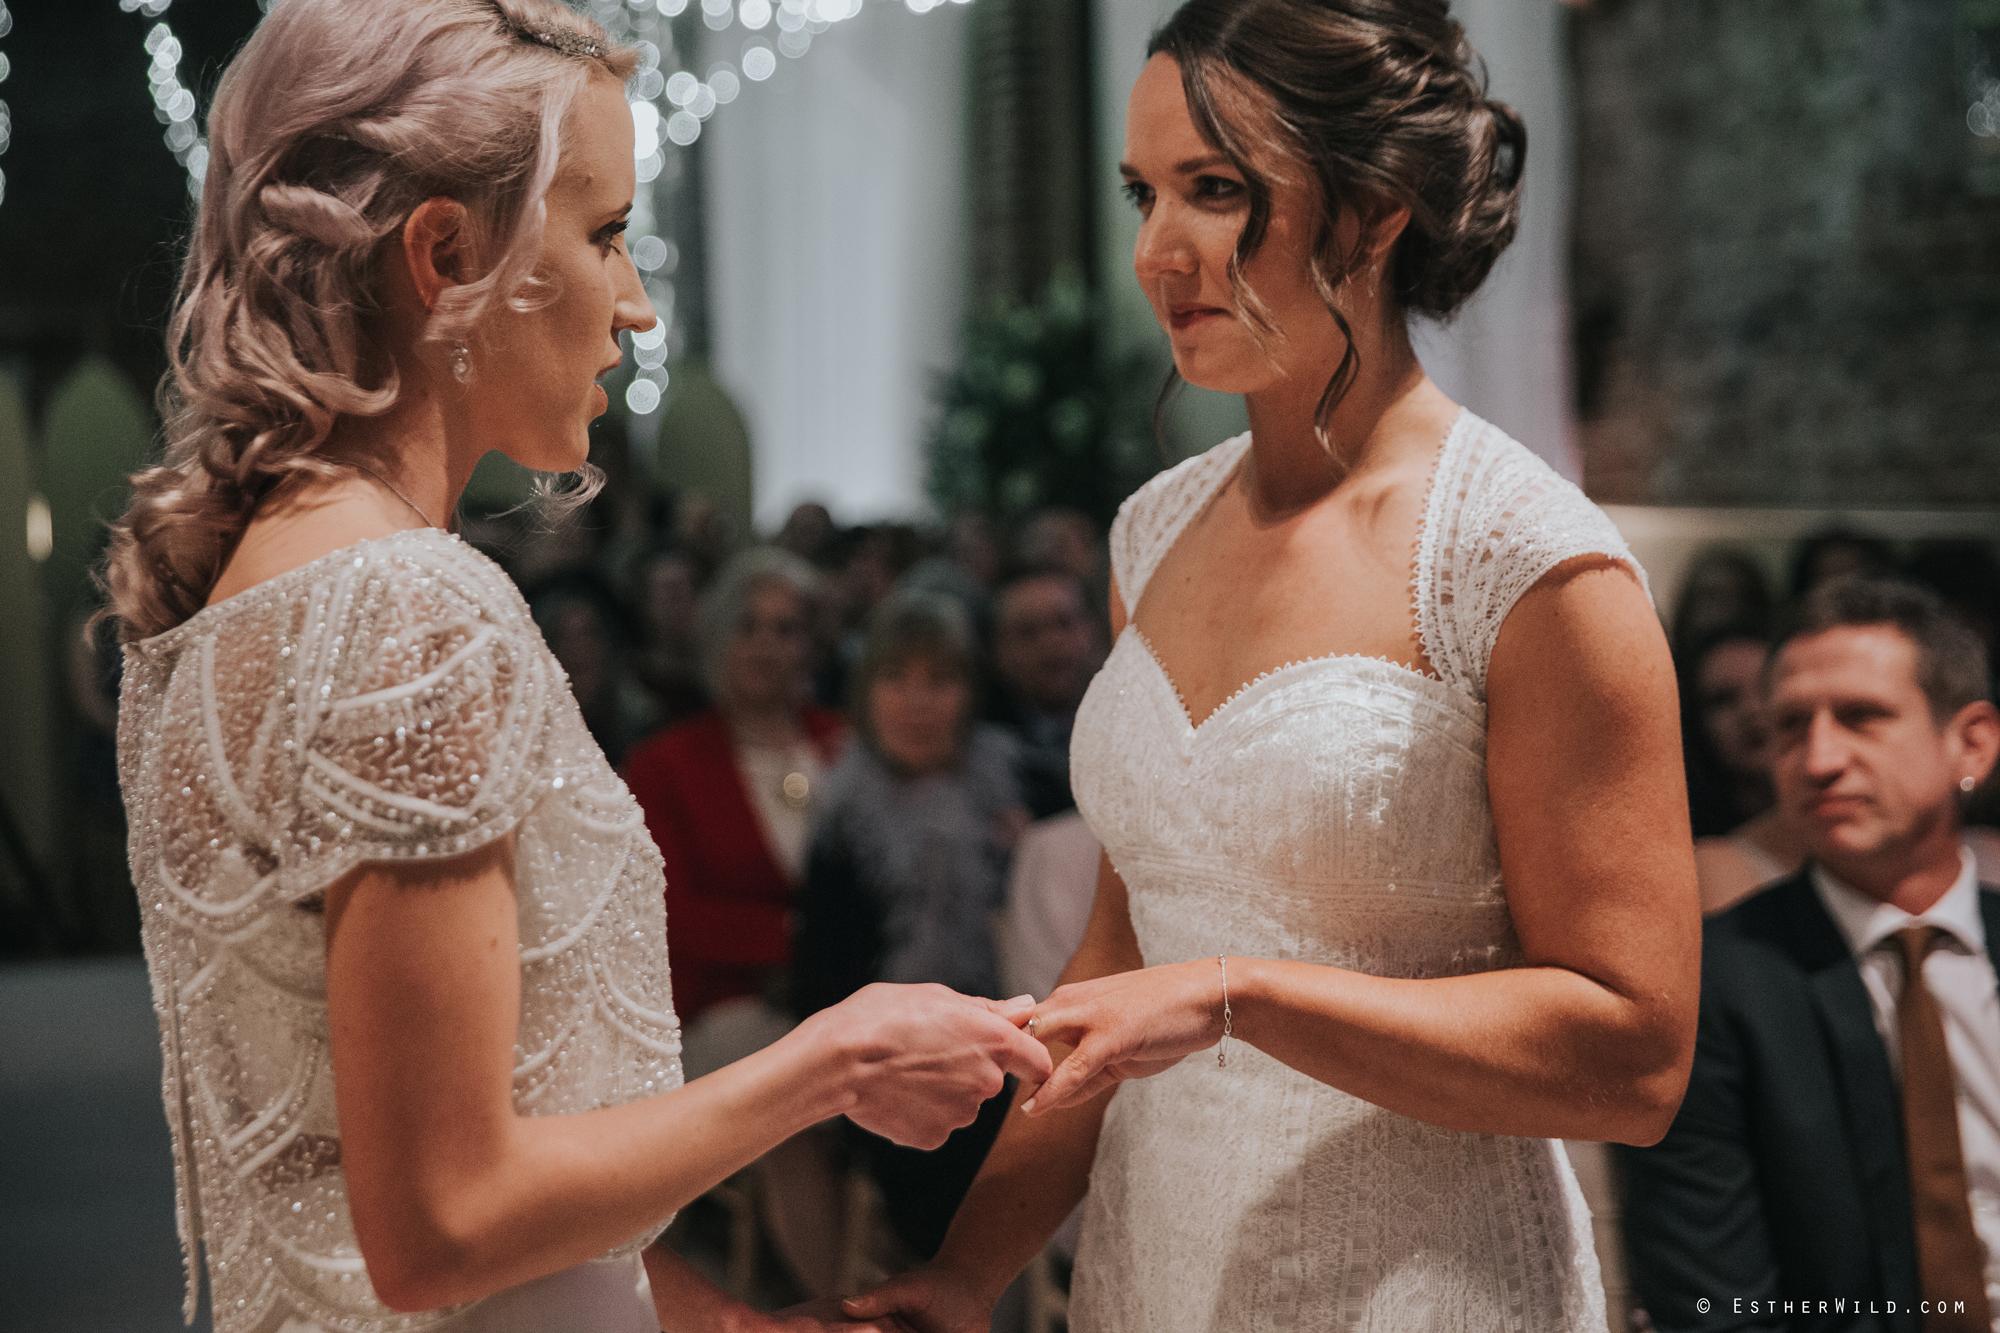 Elms_Barn_Weddings_Suffolk_Photographer_Copyright_Esther_Wild_IMG_1233.jpg